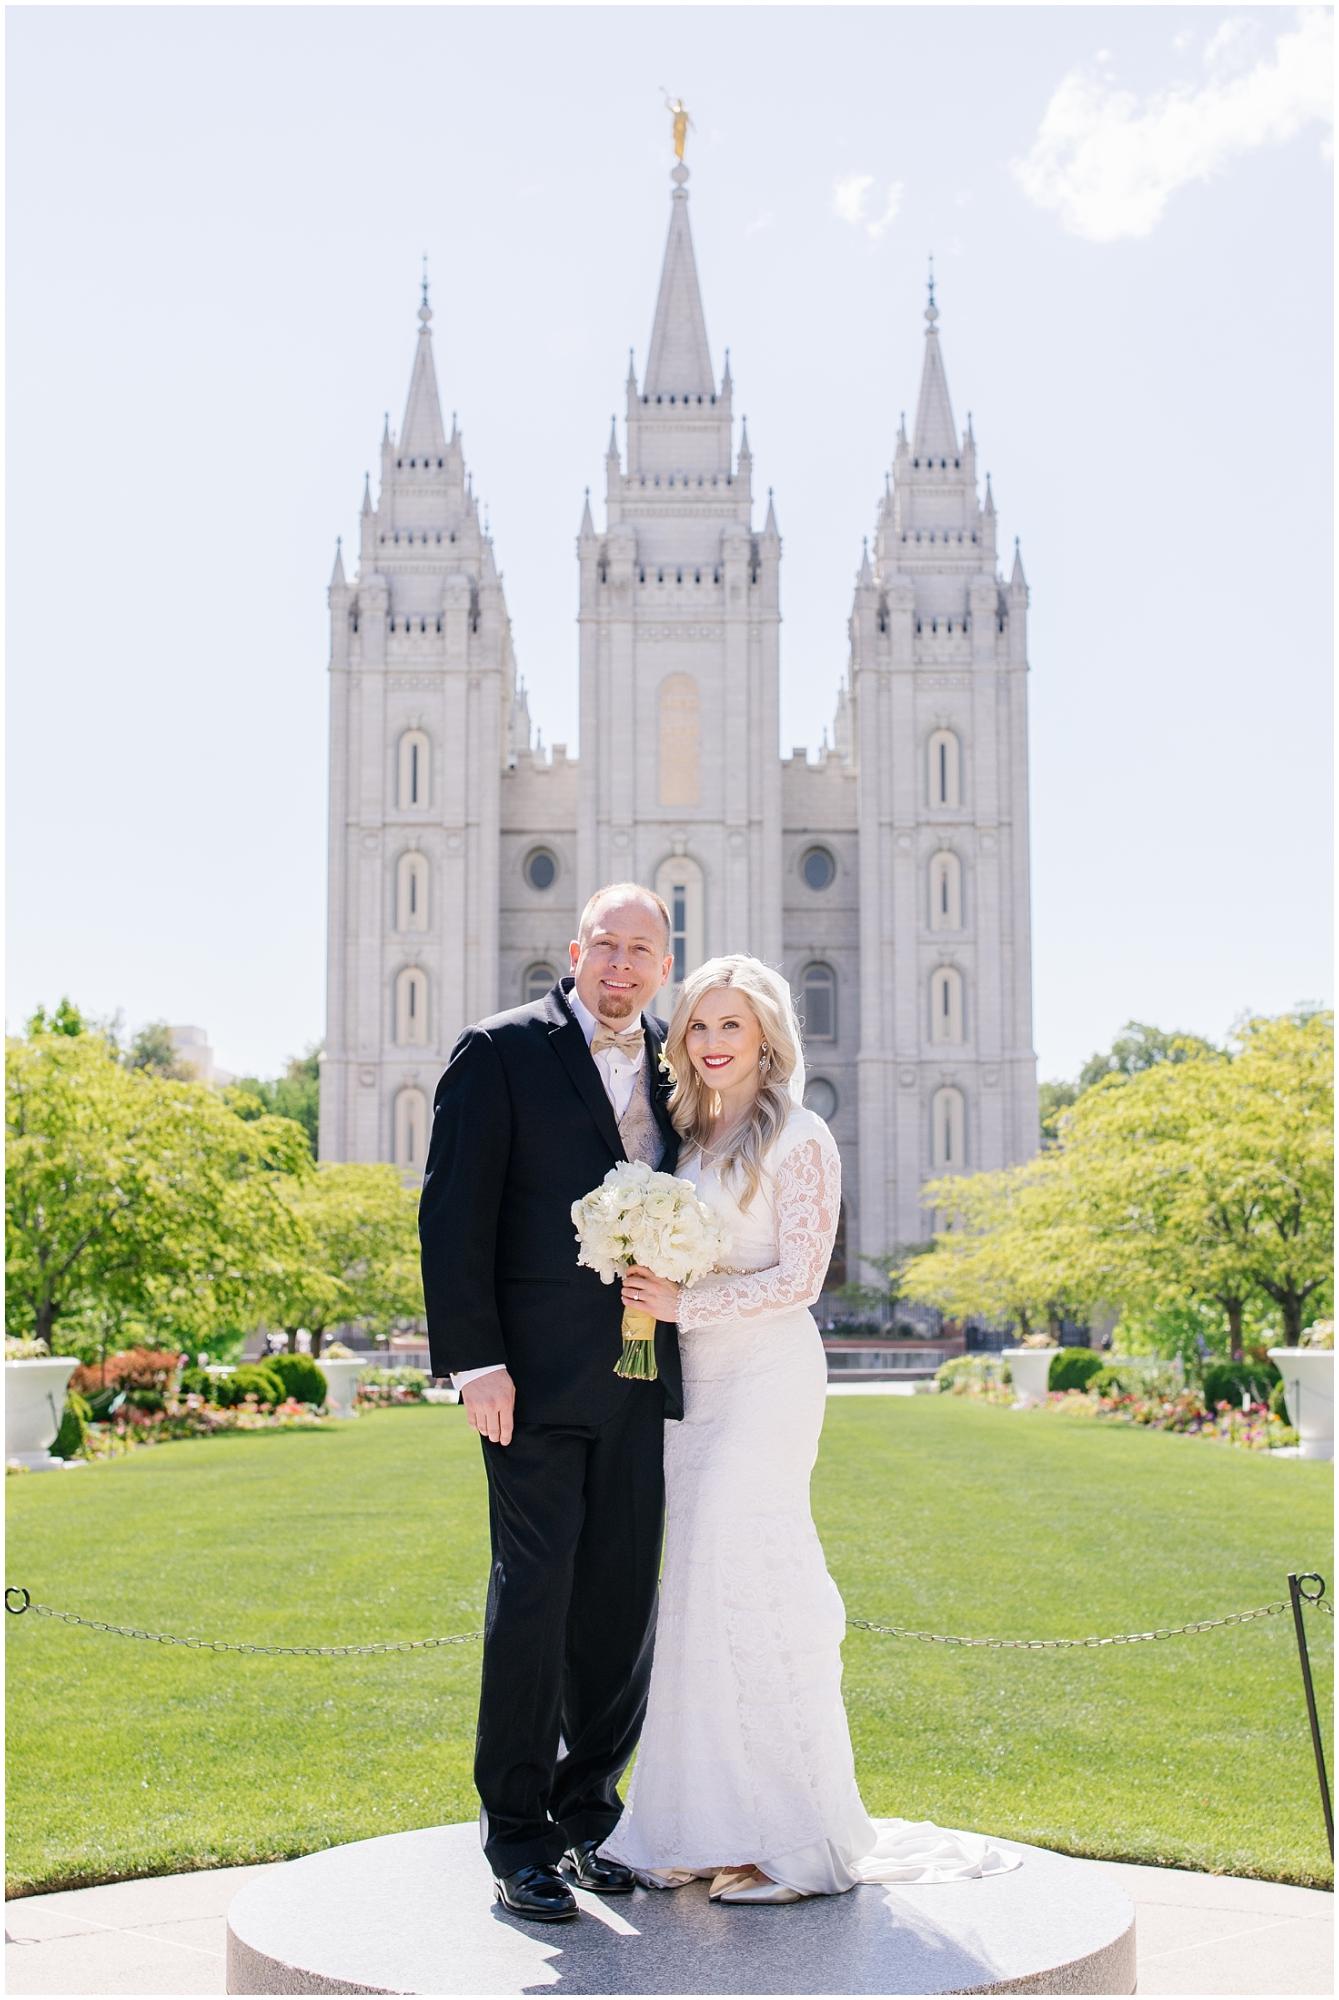 CherylandTyler-311_Lizzie-B-Imagery-Utah-Wedding-Photographer-Park-City-Salt-Lake-City-Temple-Wells-Fargo-Building.jpg